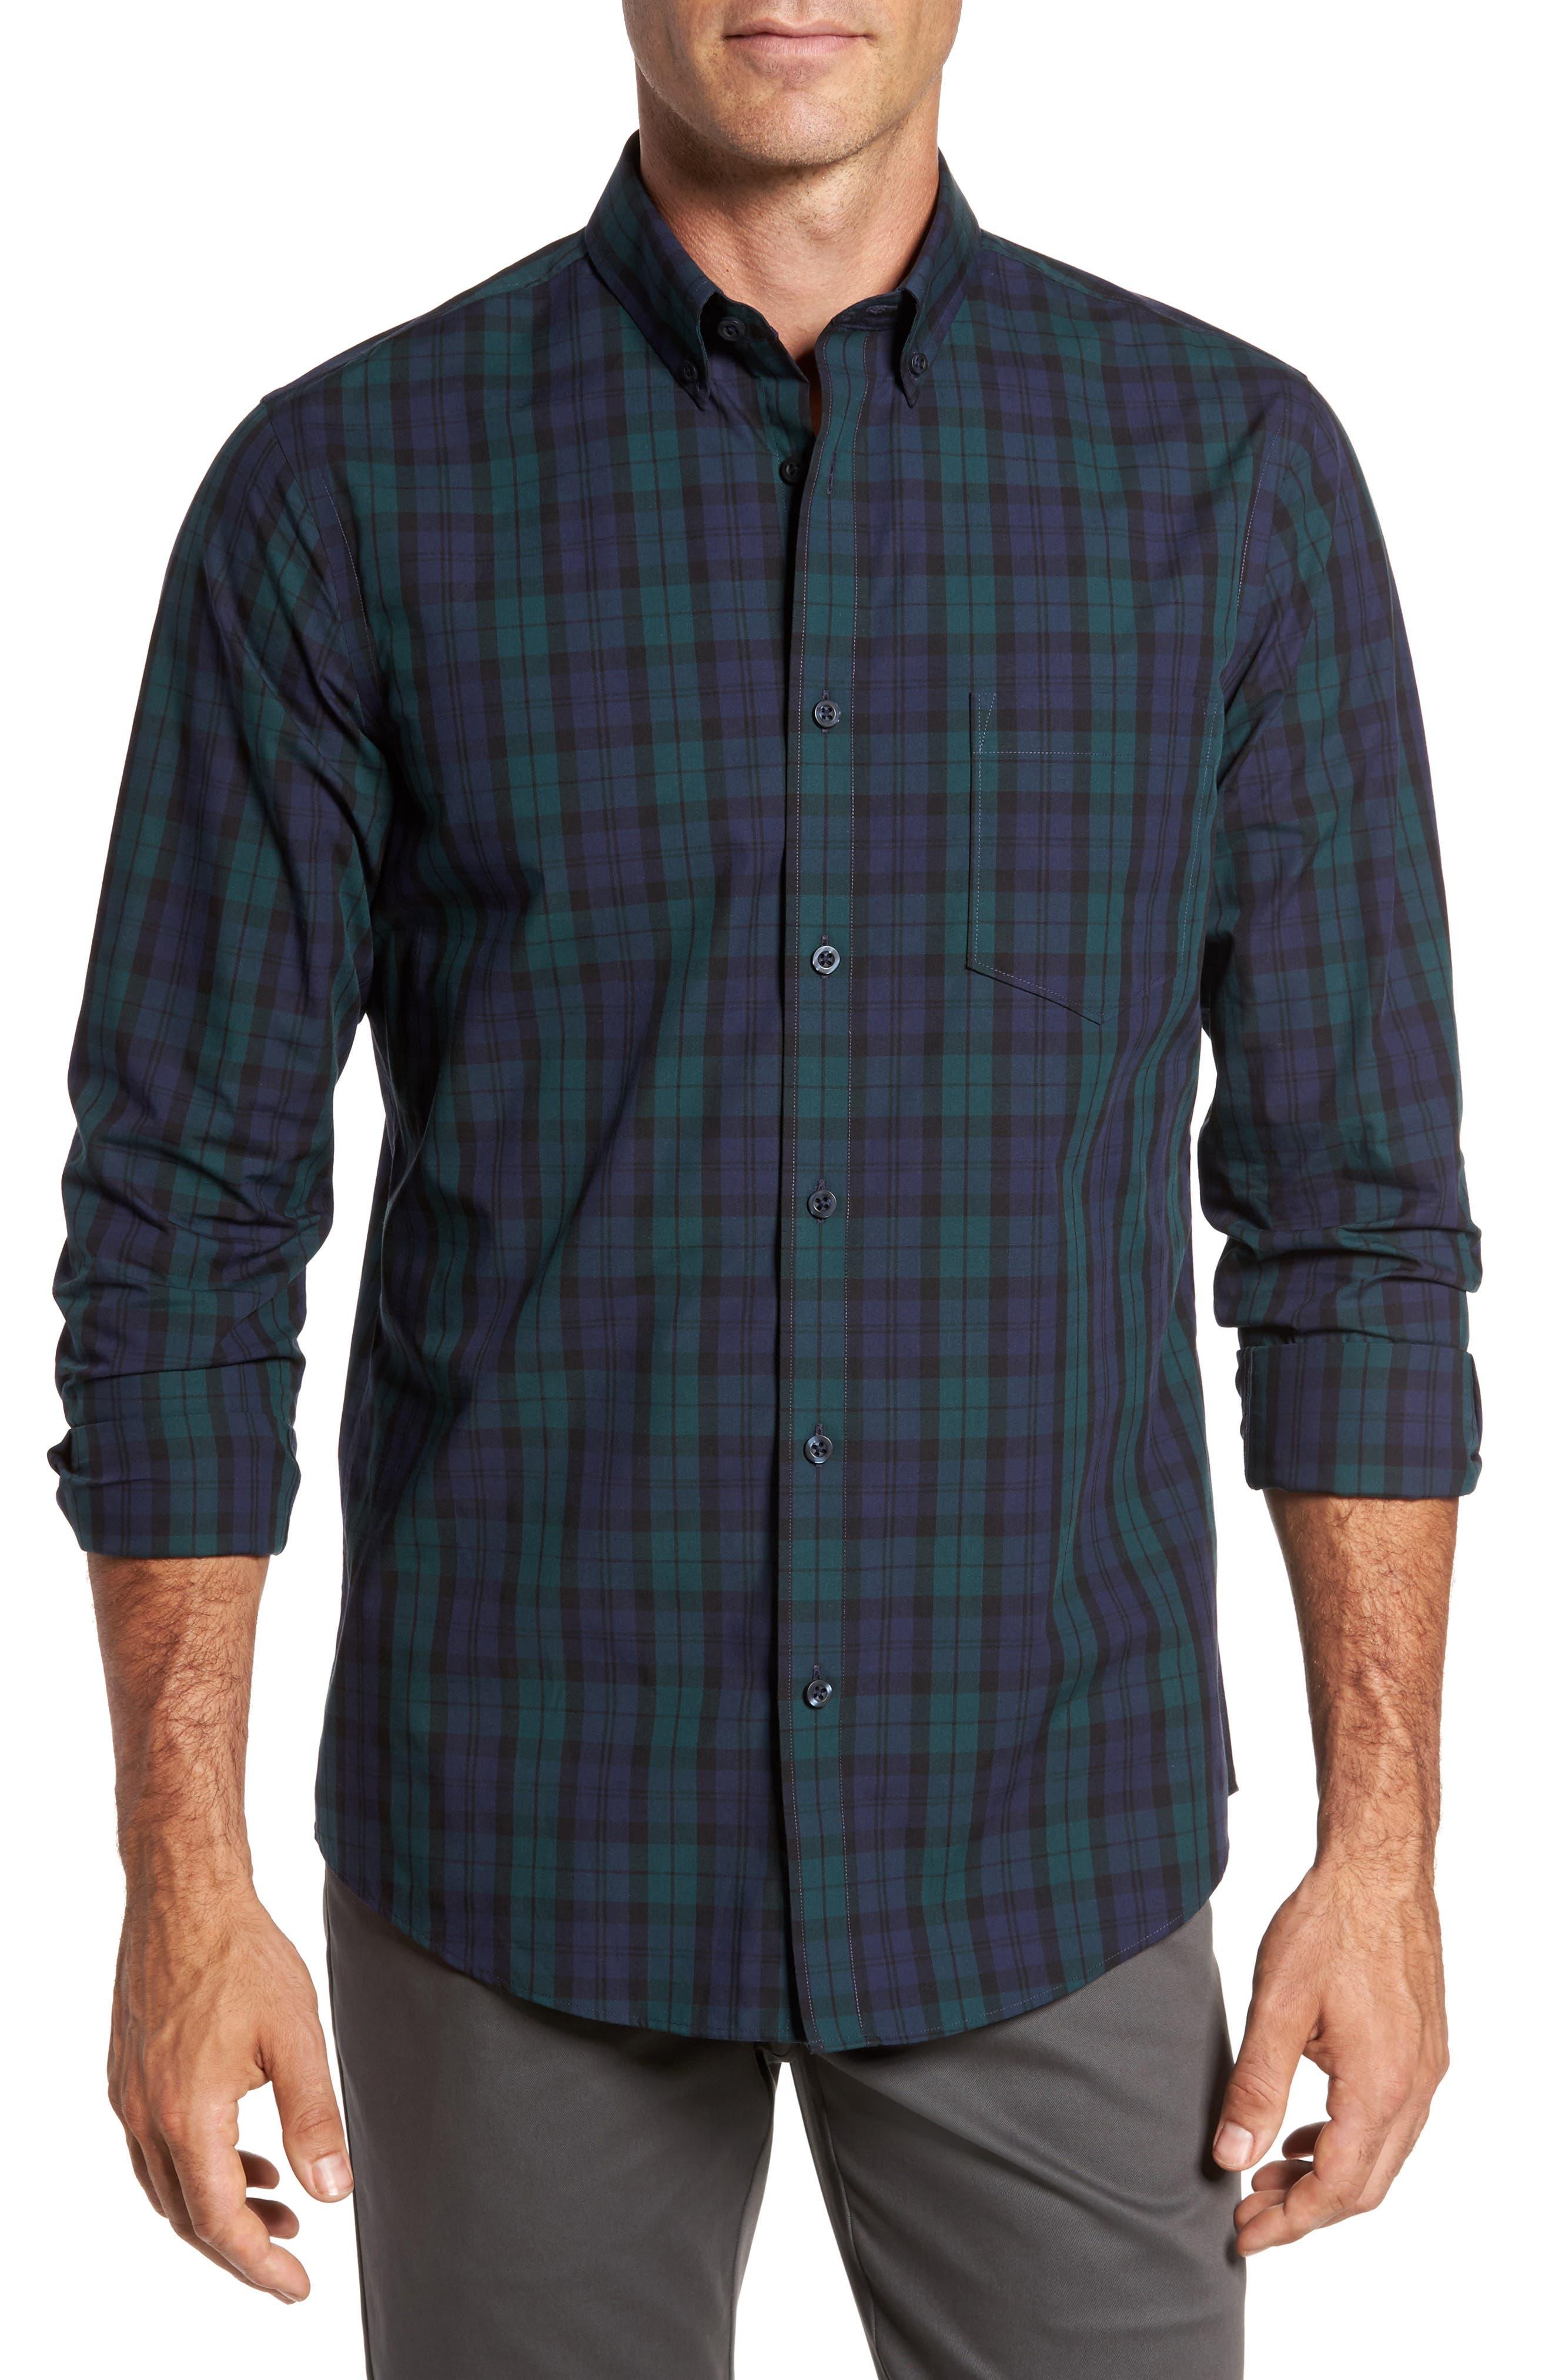 Regular Fit Non-Iron Plaid Sport Shirt,                             Main thumbnail 1, color,                             Green Bug Navy Tartan